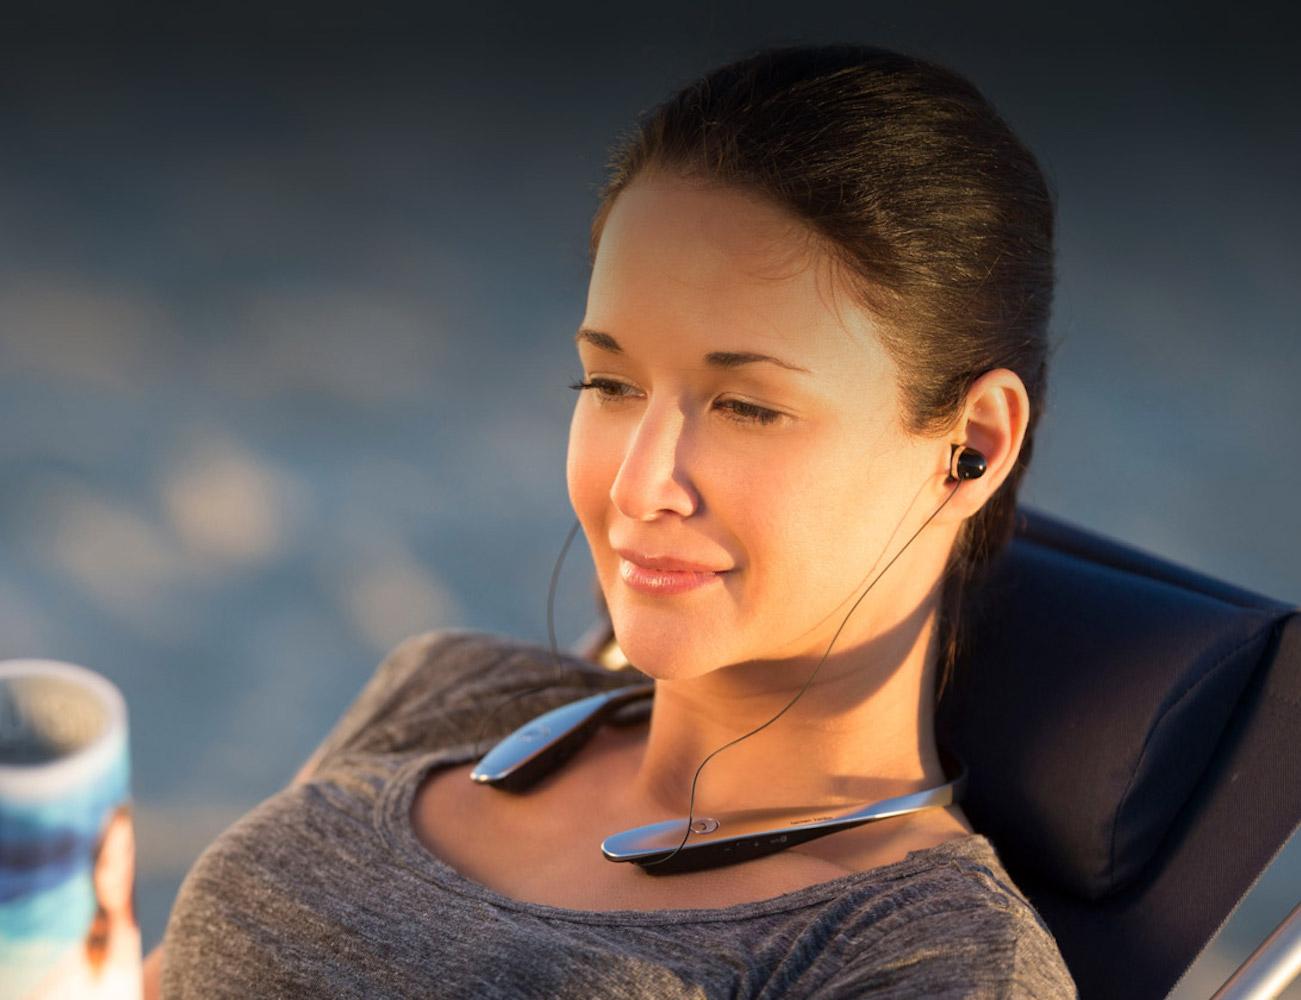 LG+TONE+Active+Premium+Wireless+Stereo+Headset